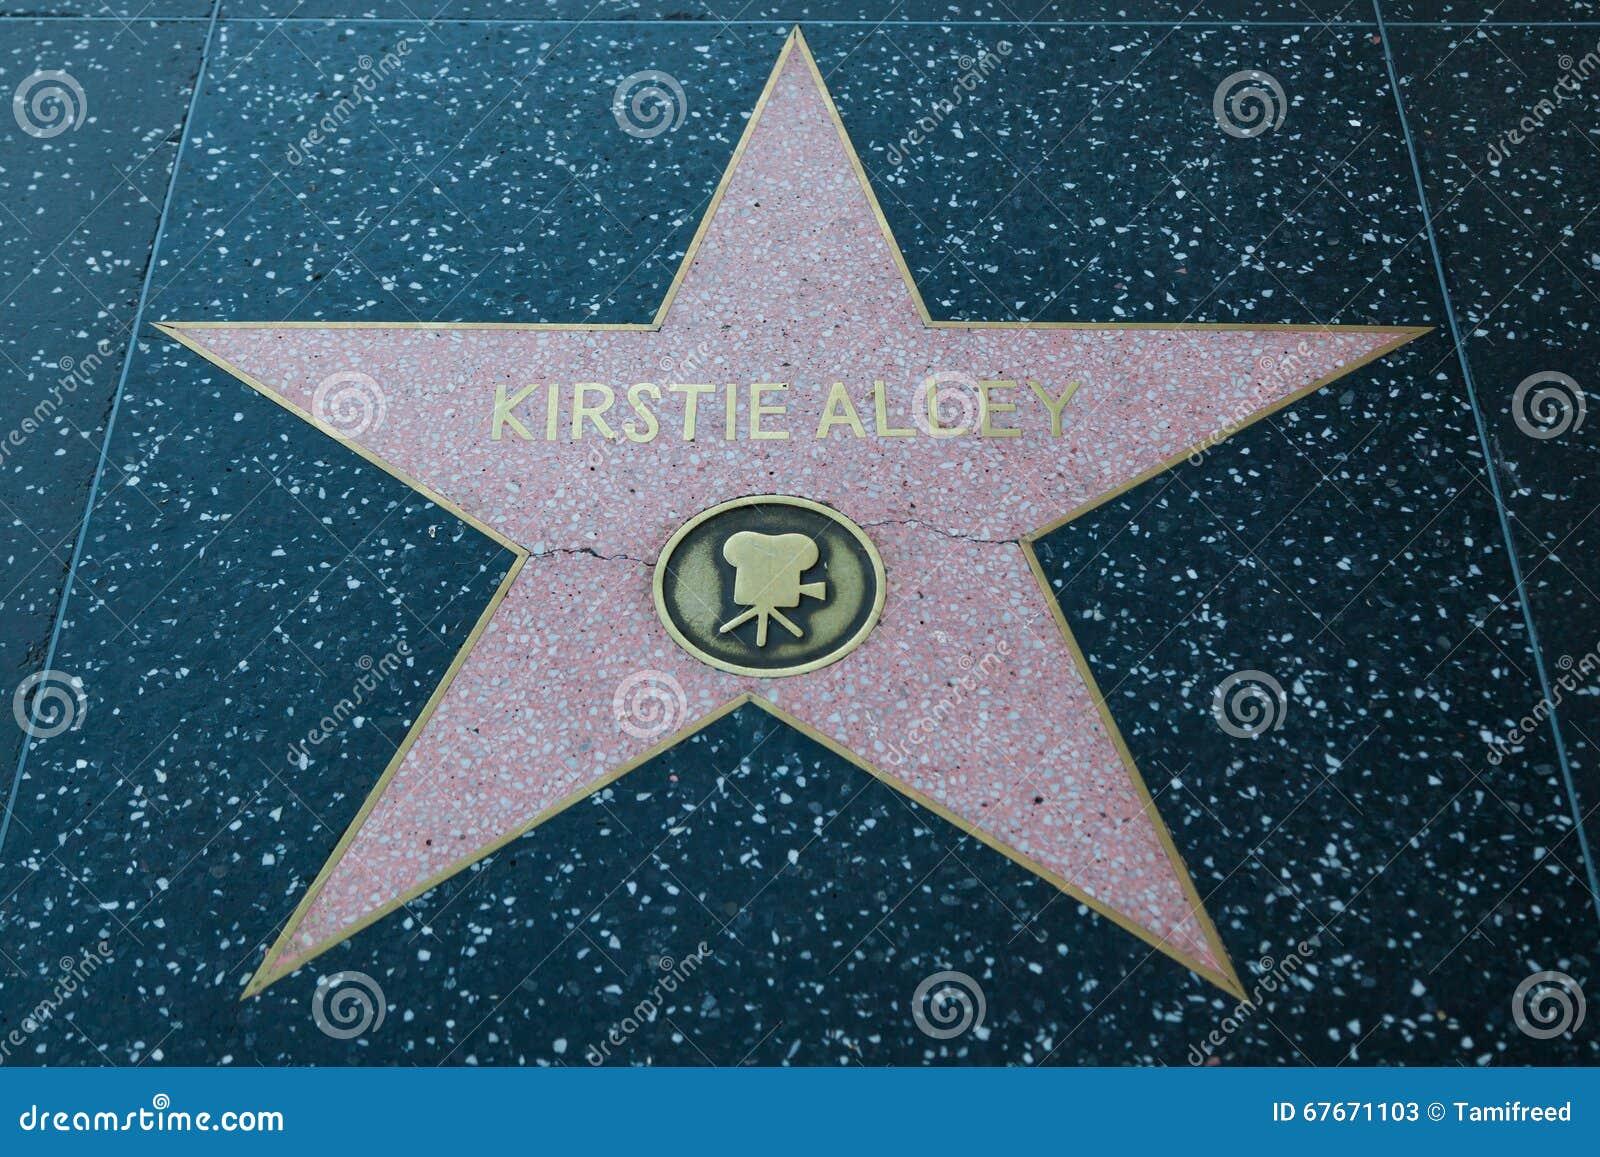 Kirstie胡同好莱坞明星